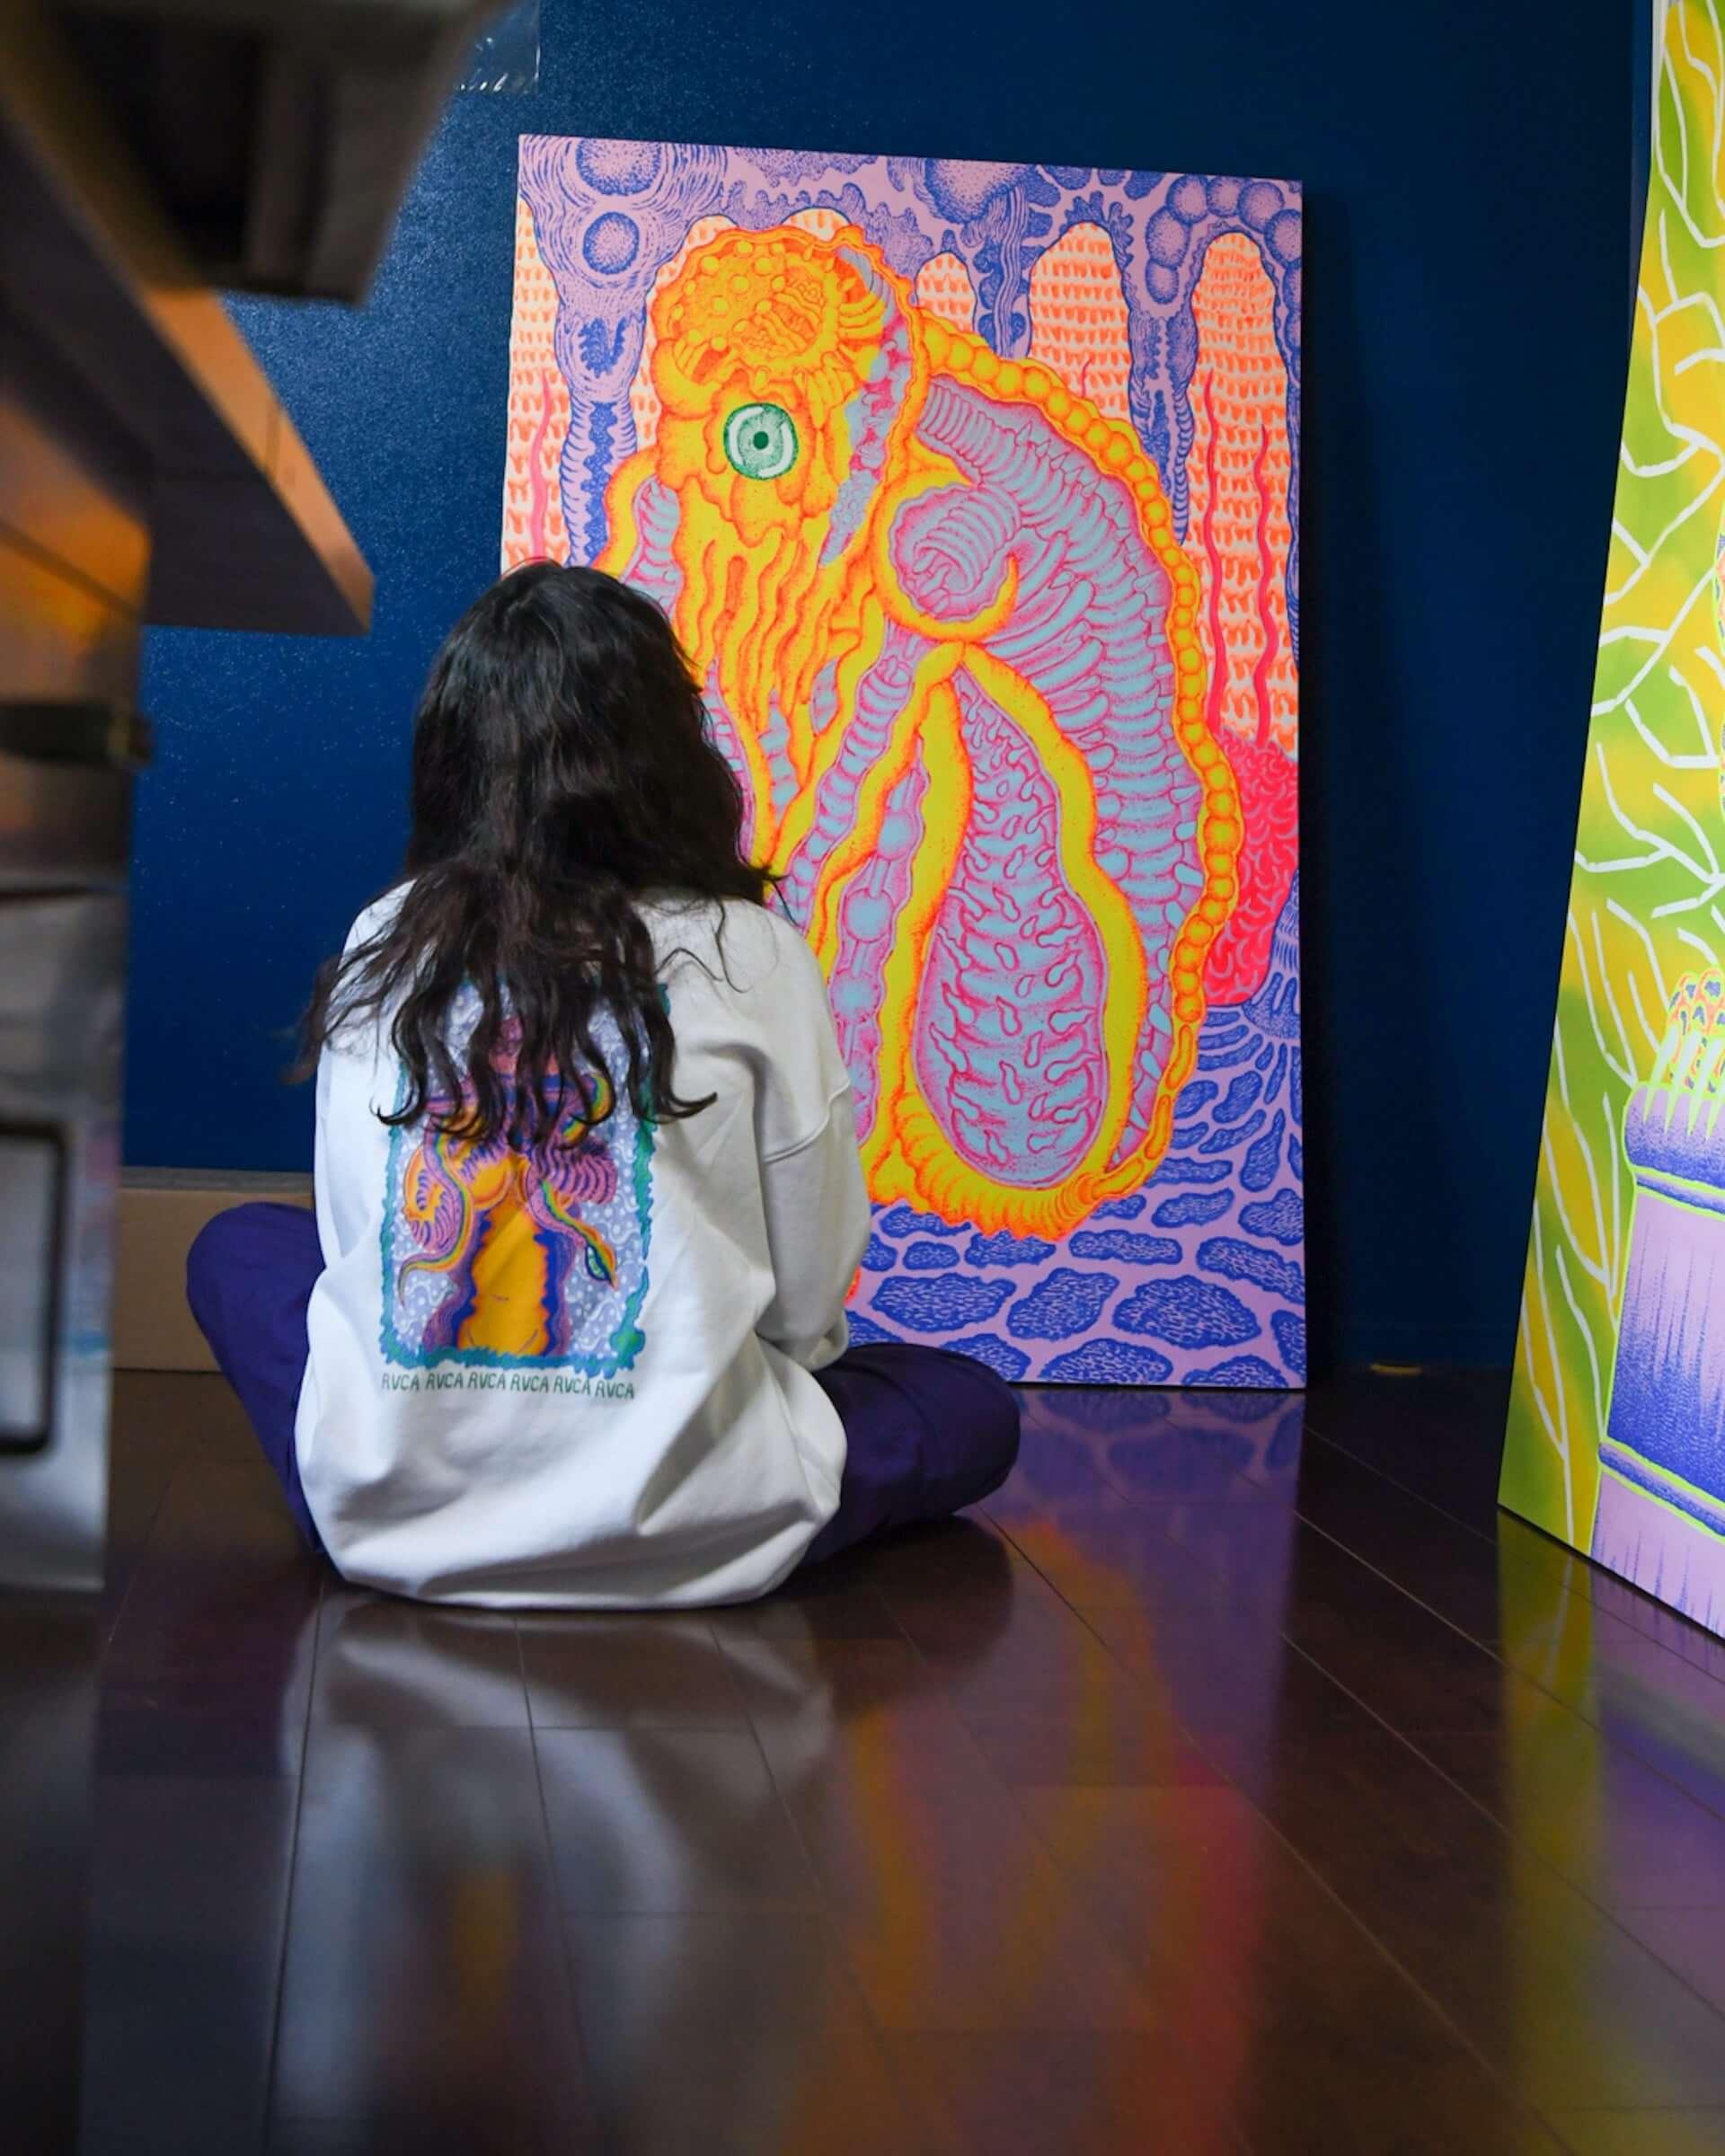 TETSUNORI TAWARAYAのアート展が「RVCA STORE SHIBUYA Gallery」にて開催決定!アーカイブ作品など期間限定で展示 art201125_tetsunori-tawaraya_17-1920x2400